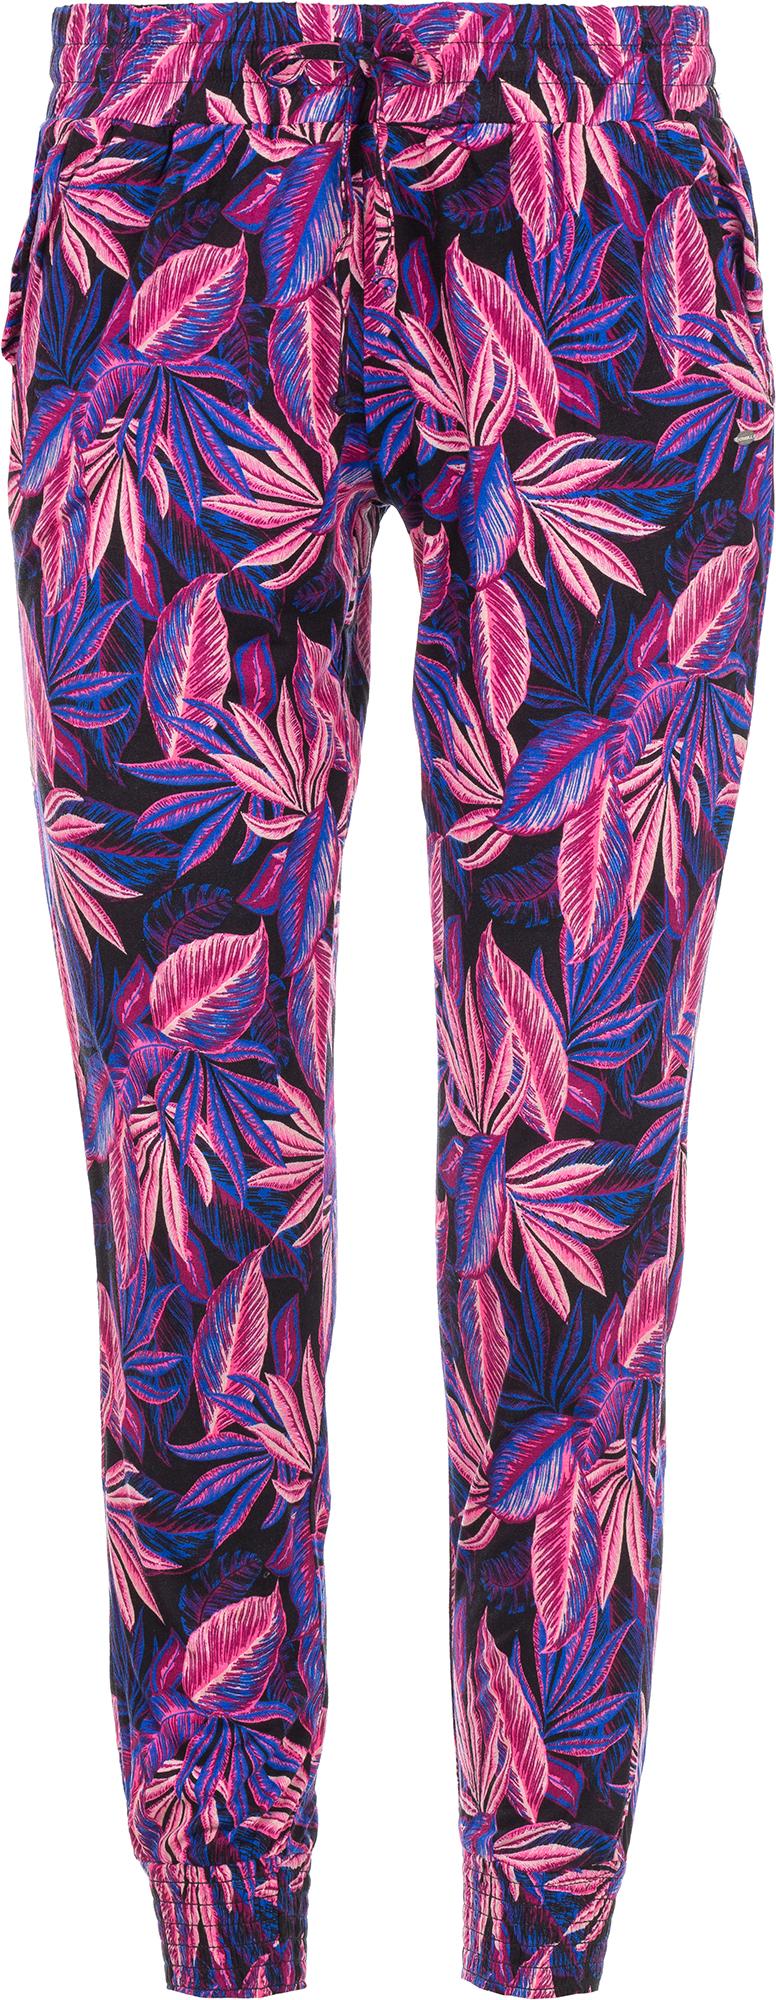 O'Neill Брюки женские O'Neill Printed Jersey, размер 48-50 брюки o neill o neill on355emaycp0